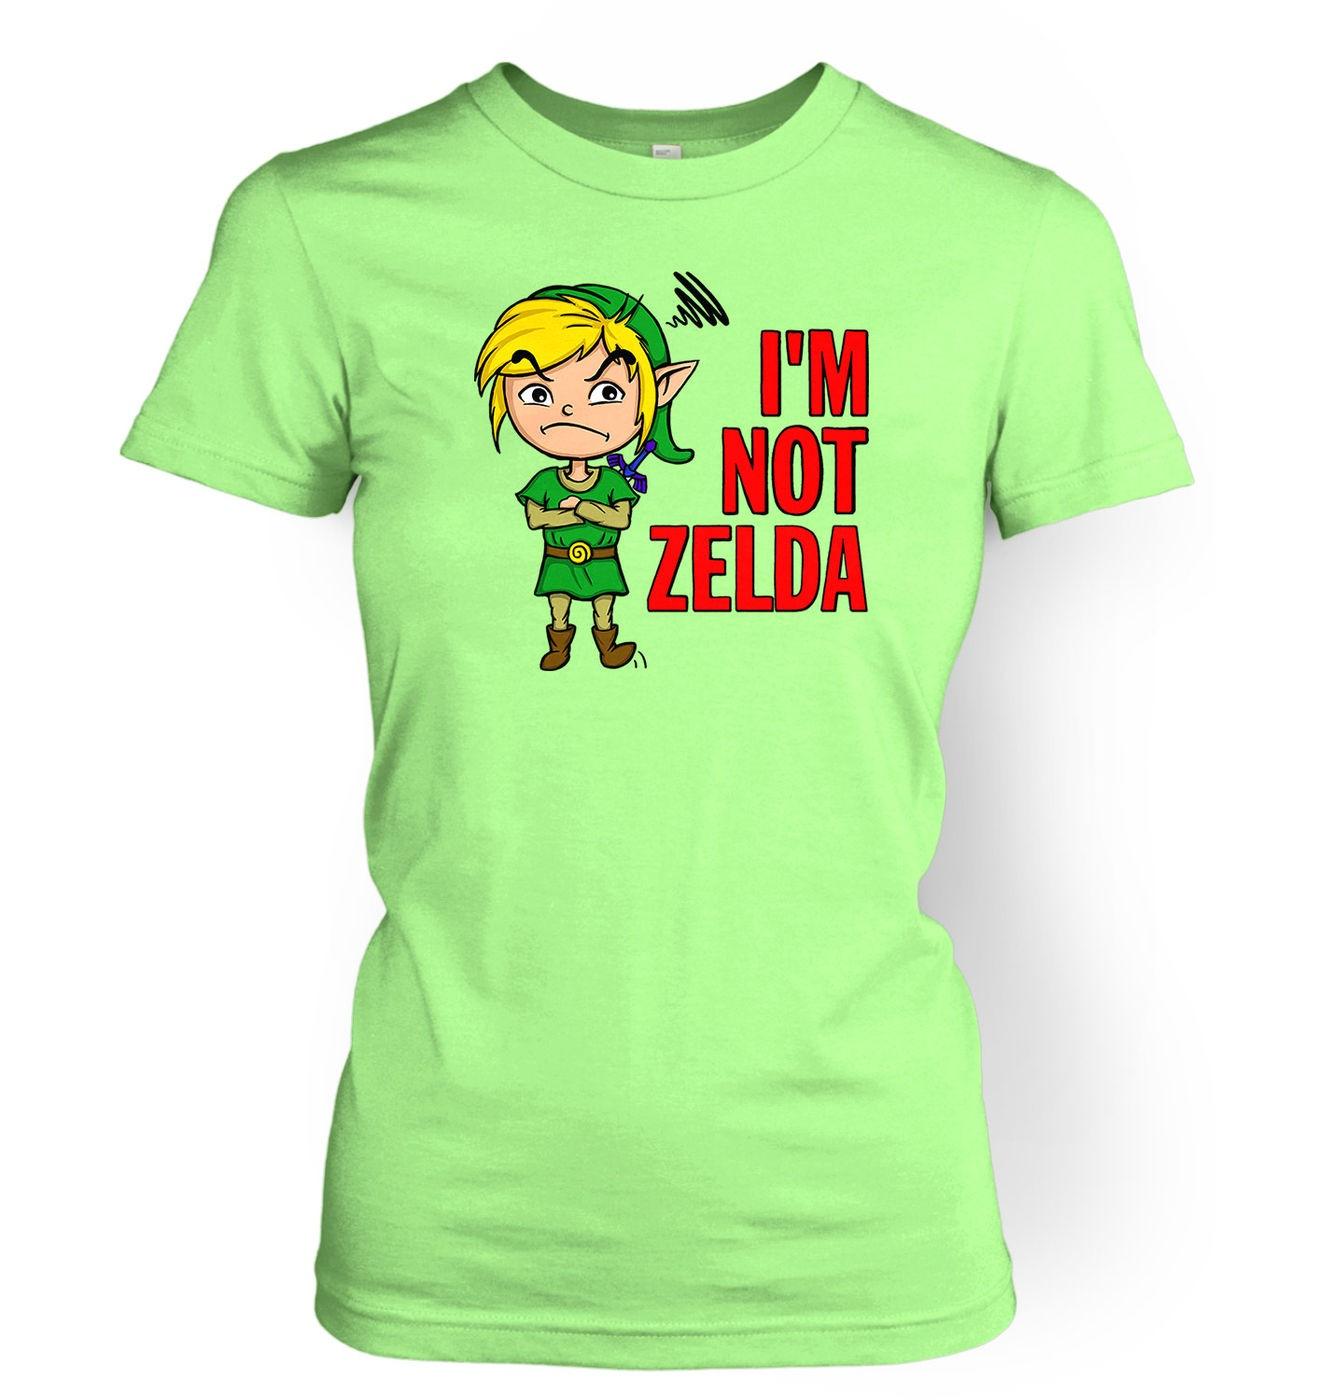 Not Zelda women's t-shirt by Something Geeky